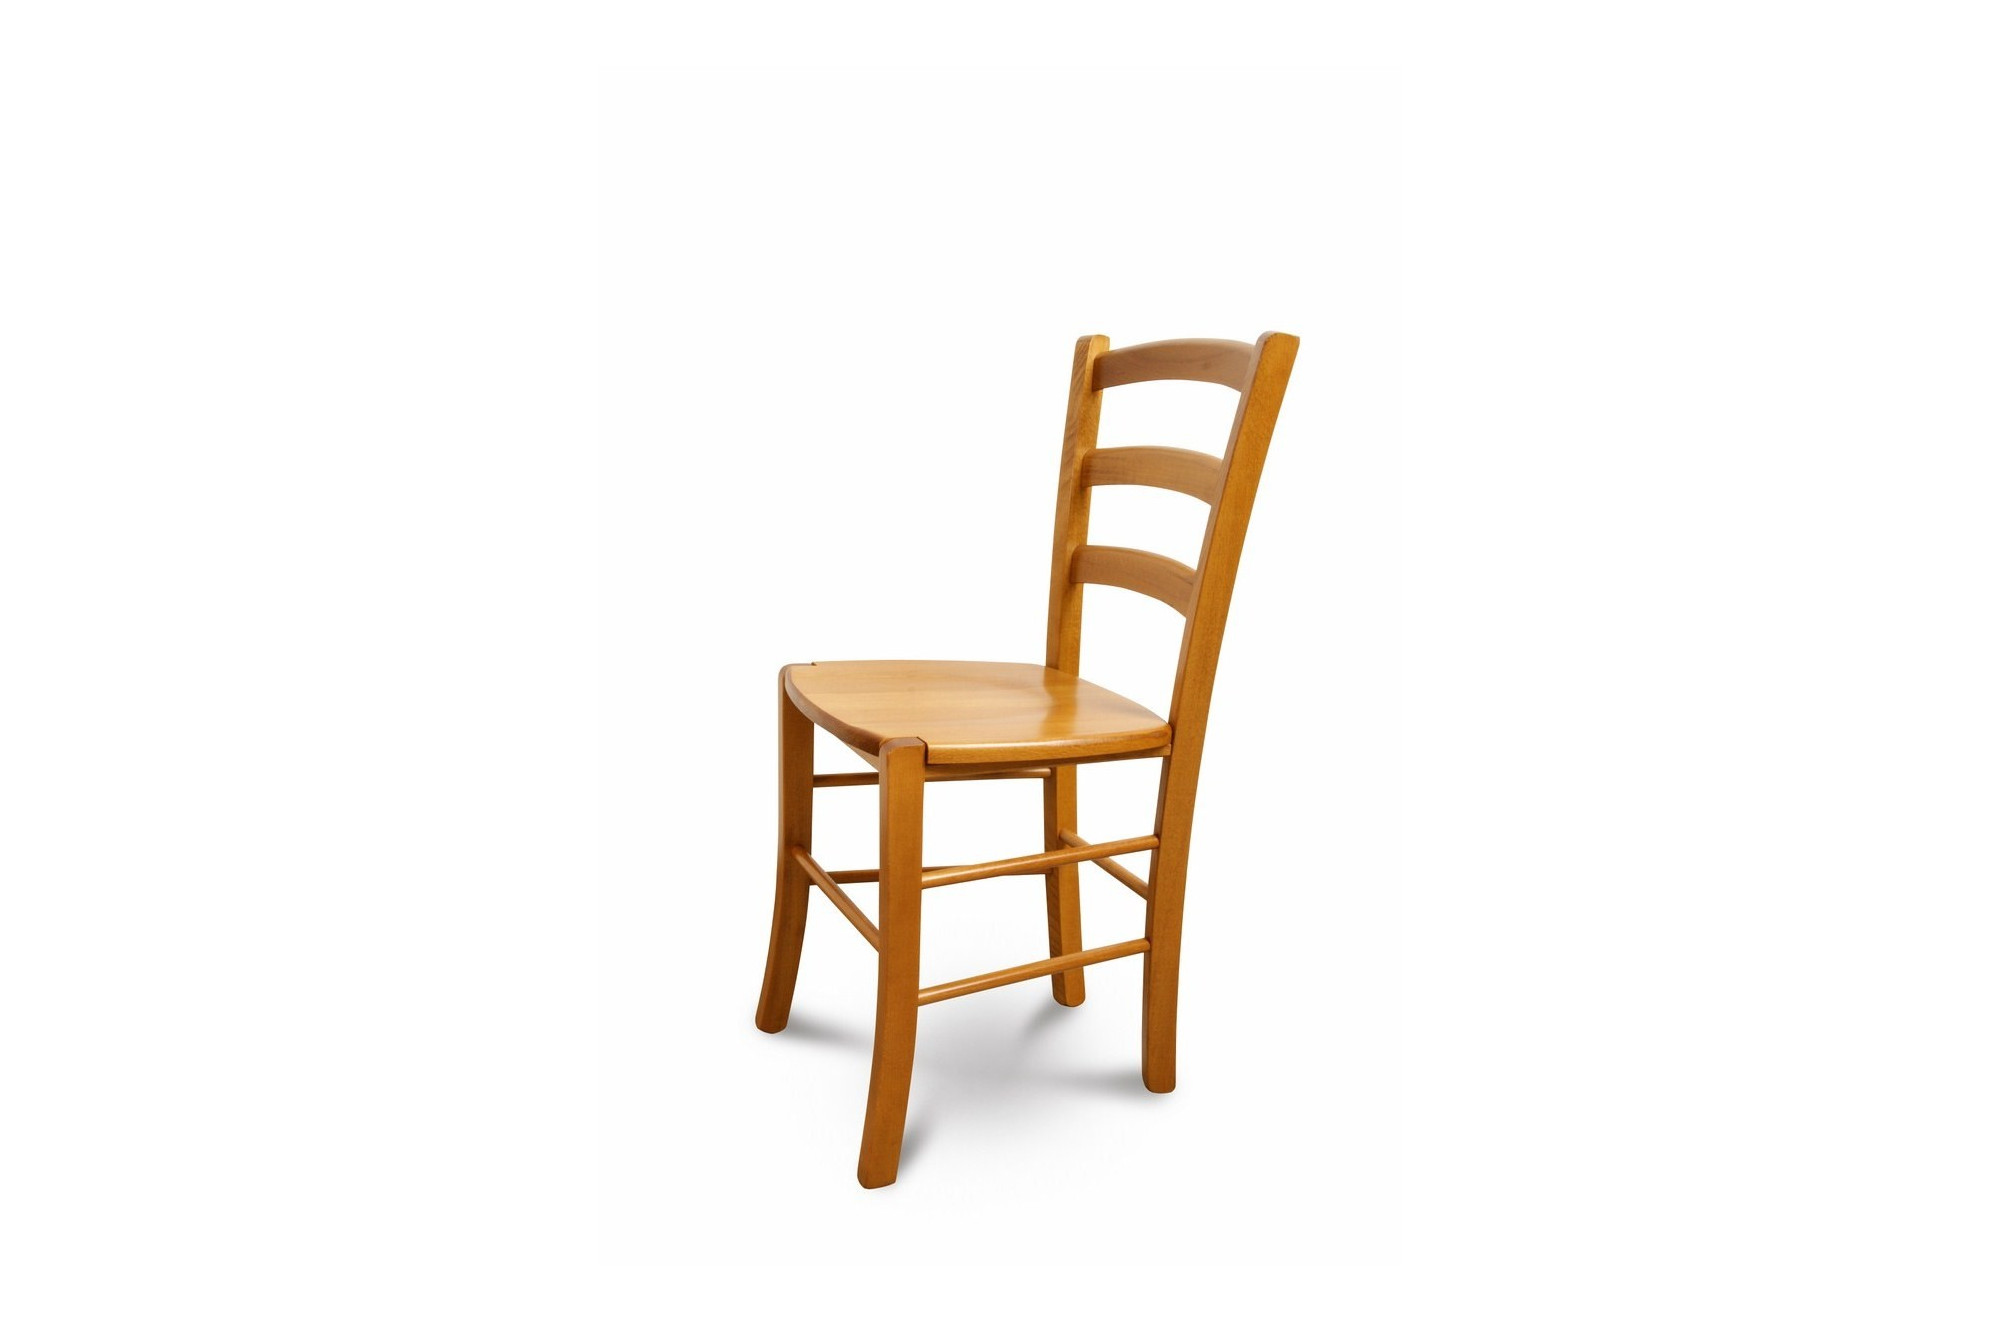 chaise en bois massif tina lot de deux hellin. Black Bedroom Furniture Sets. Home Design Ideas